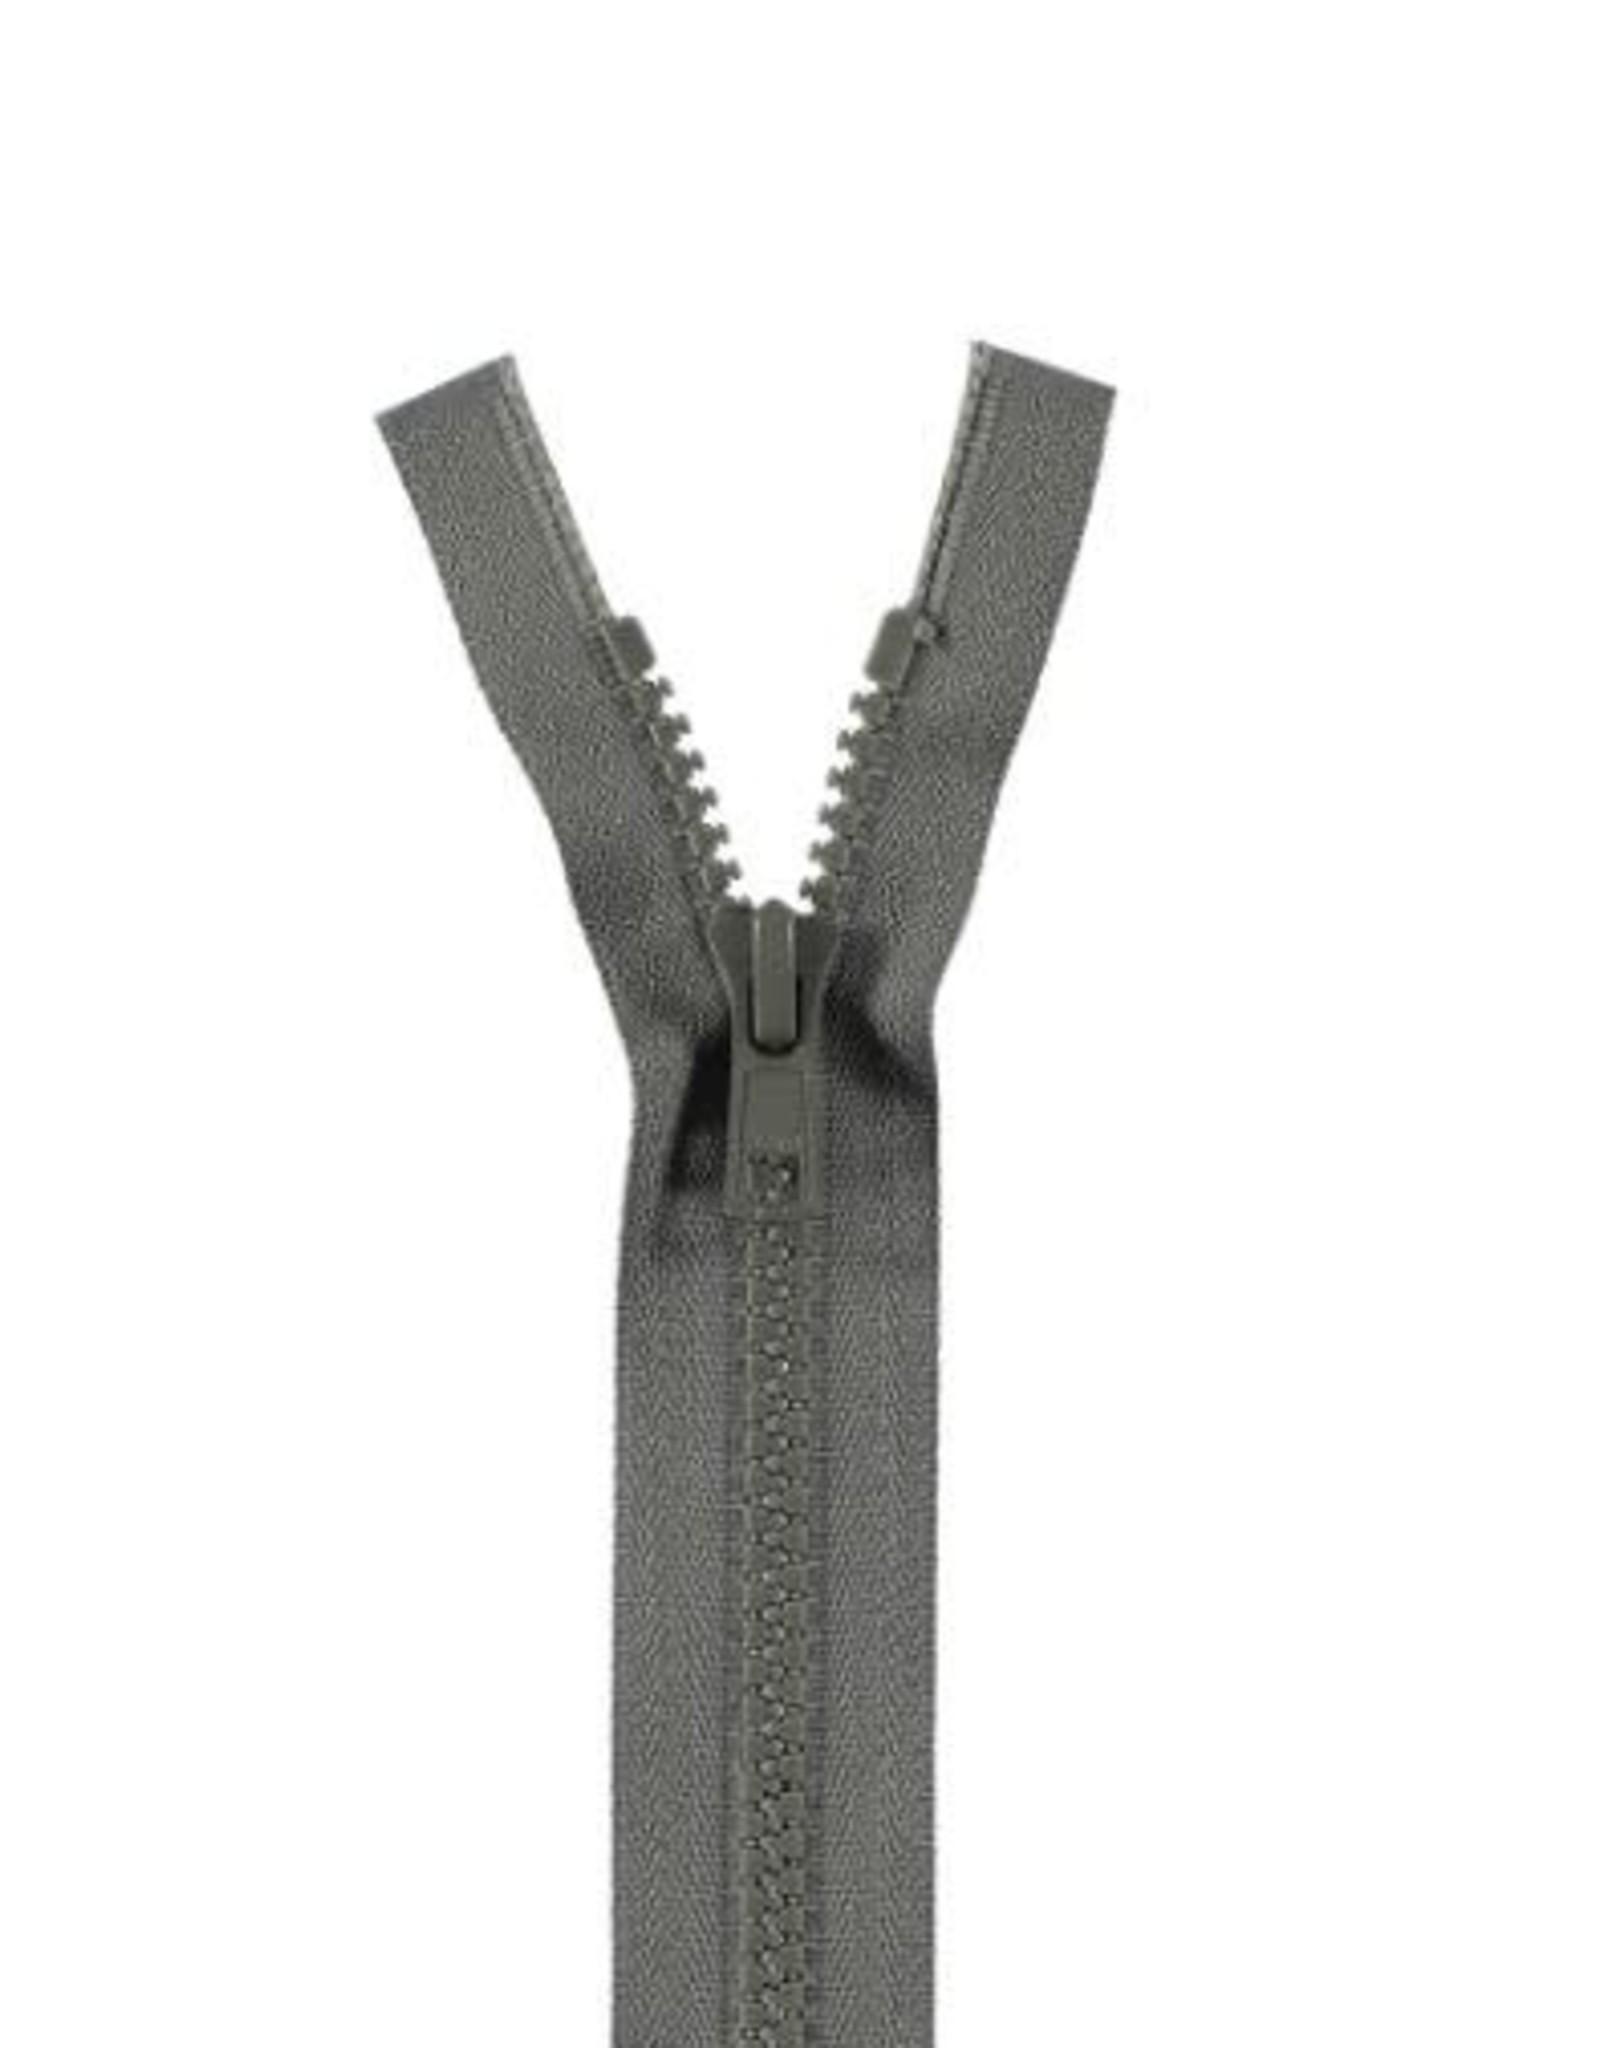 YKK BLOKRITS 5 DEELBAAR grijs 578-80cm